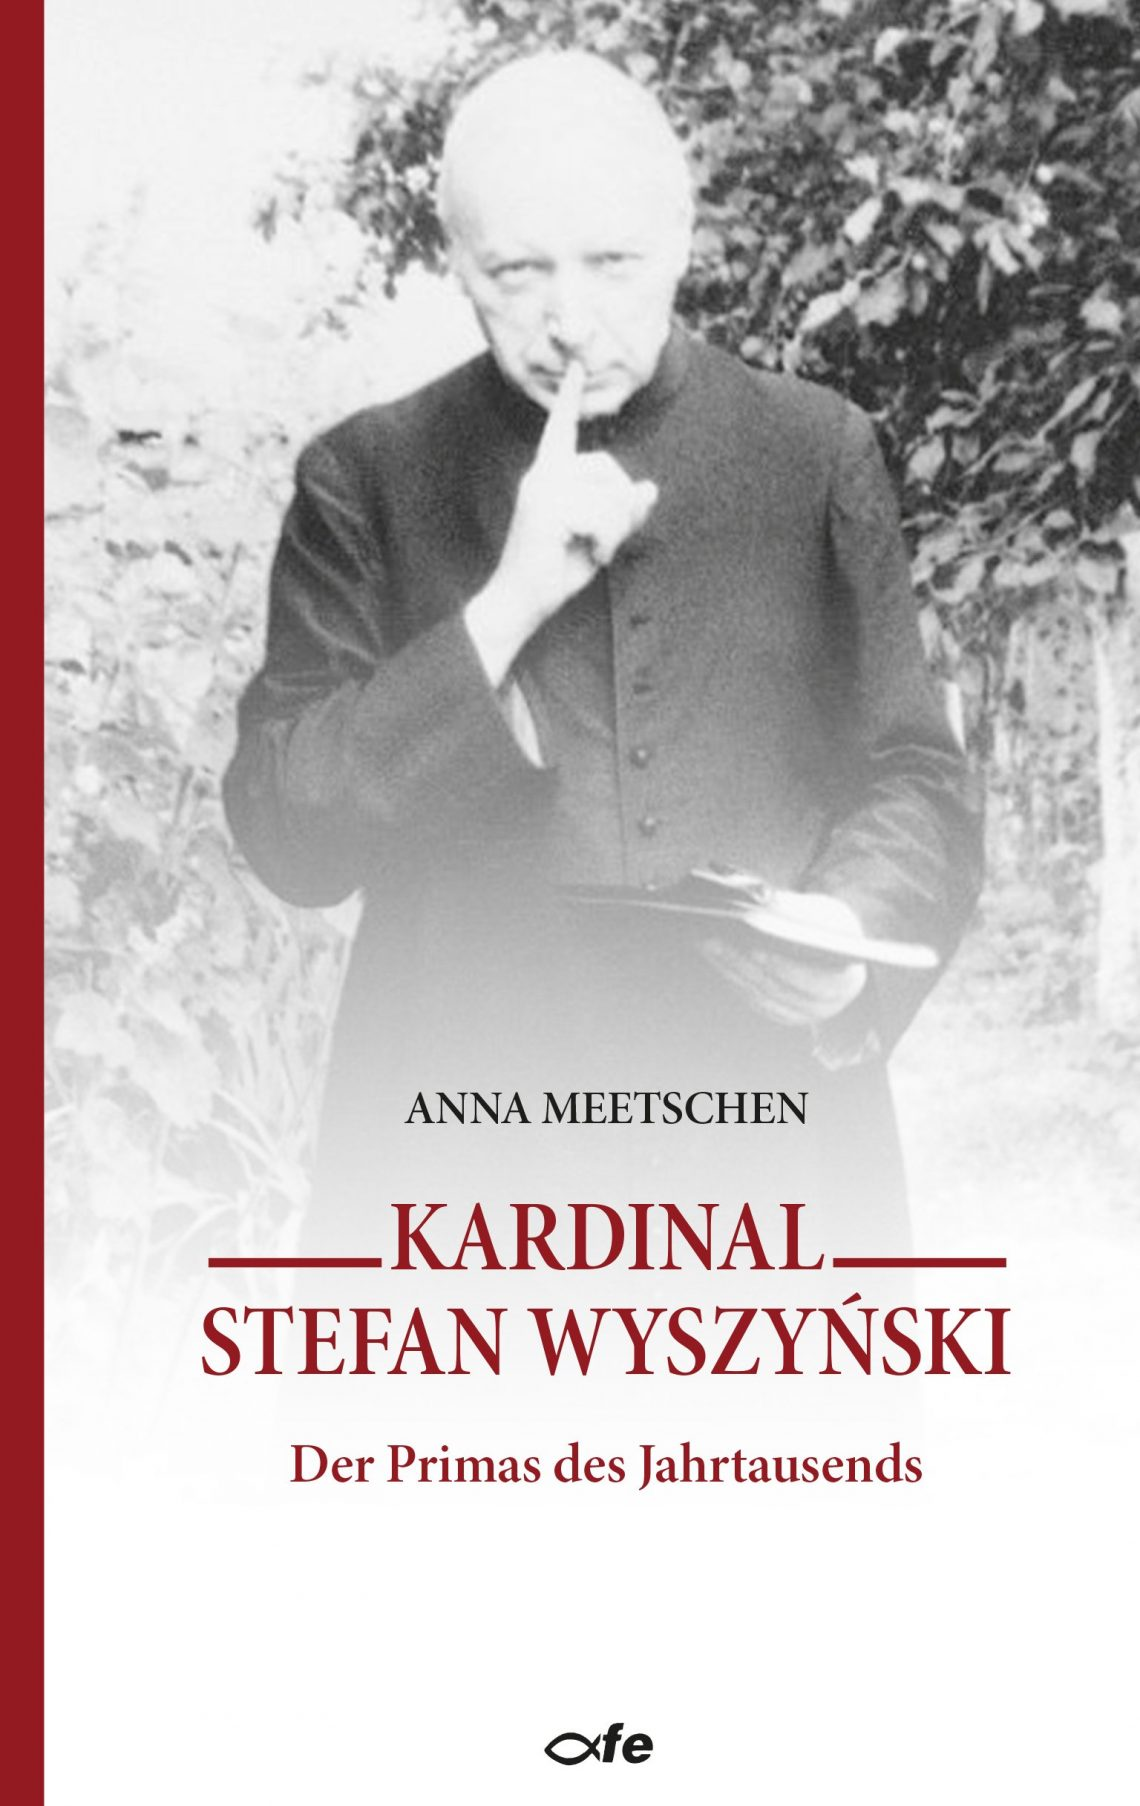 Meetschen, Anna: Kardinal Stefan Wyszyński